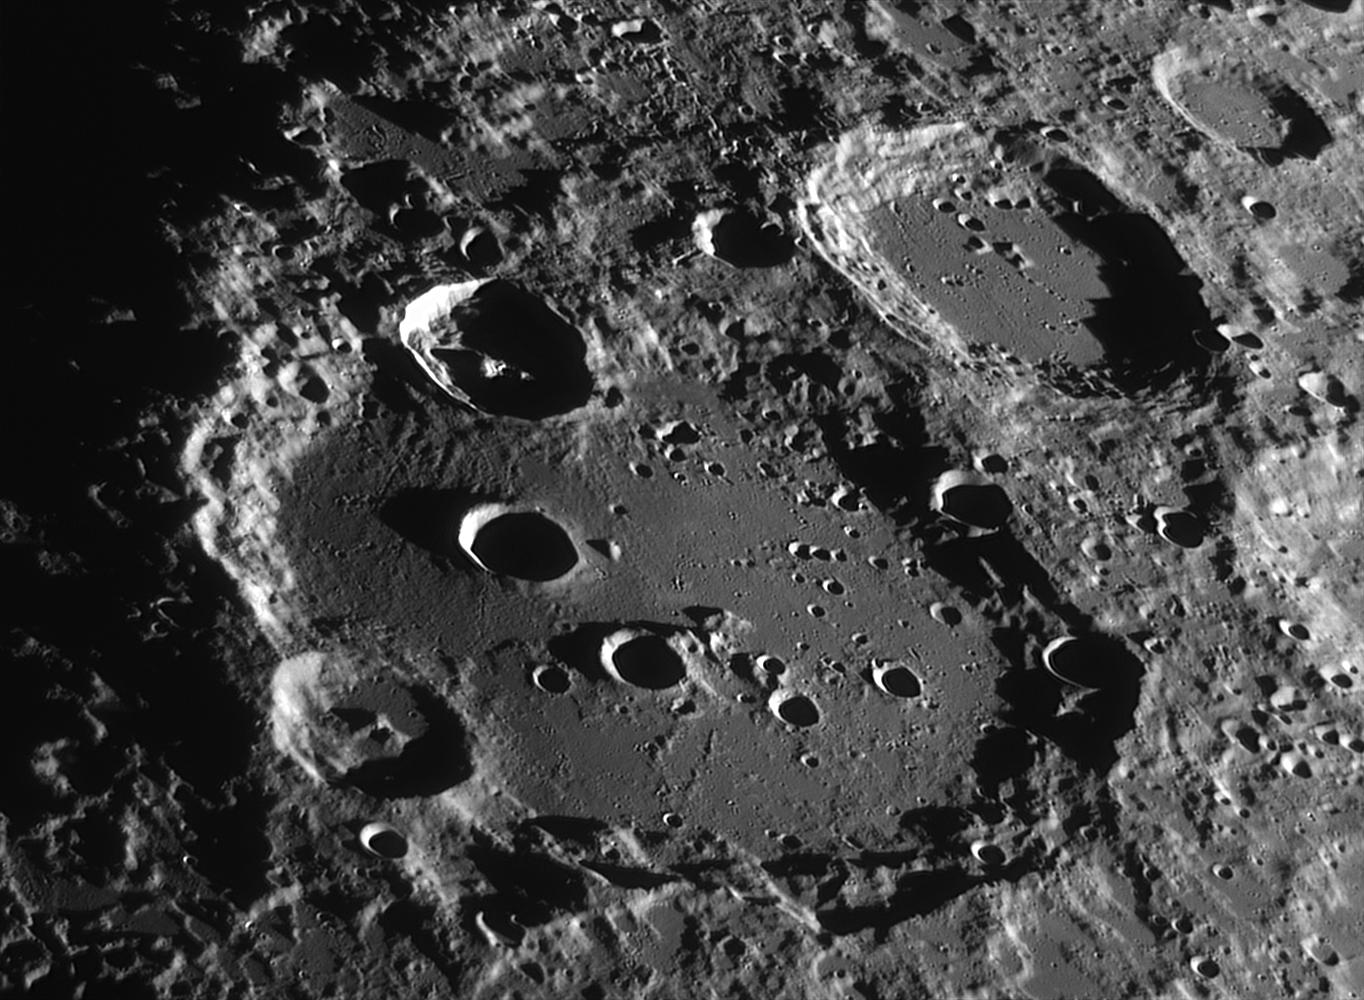 Index of viladrich astro moon closeup c14 old iris - Moon close up ...